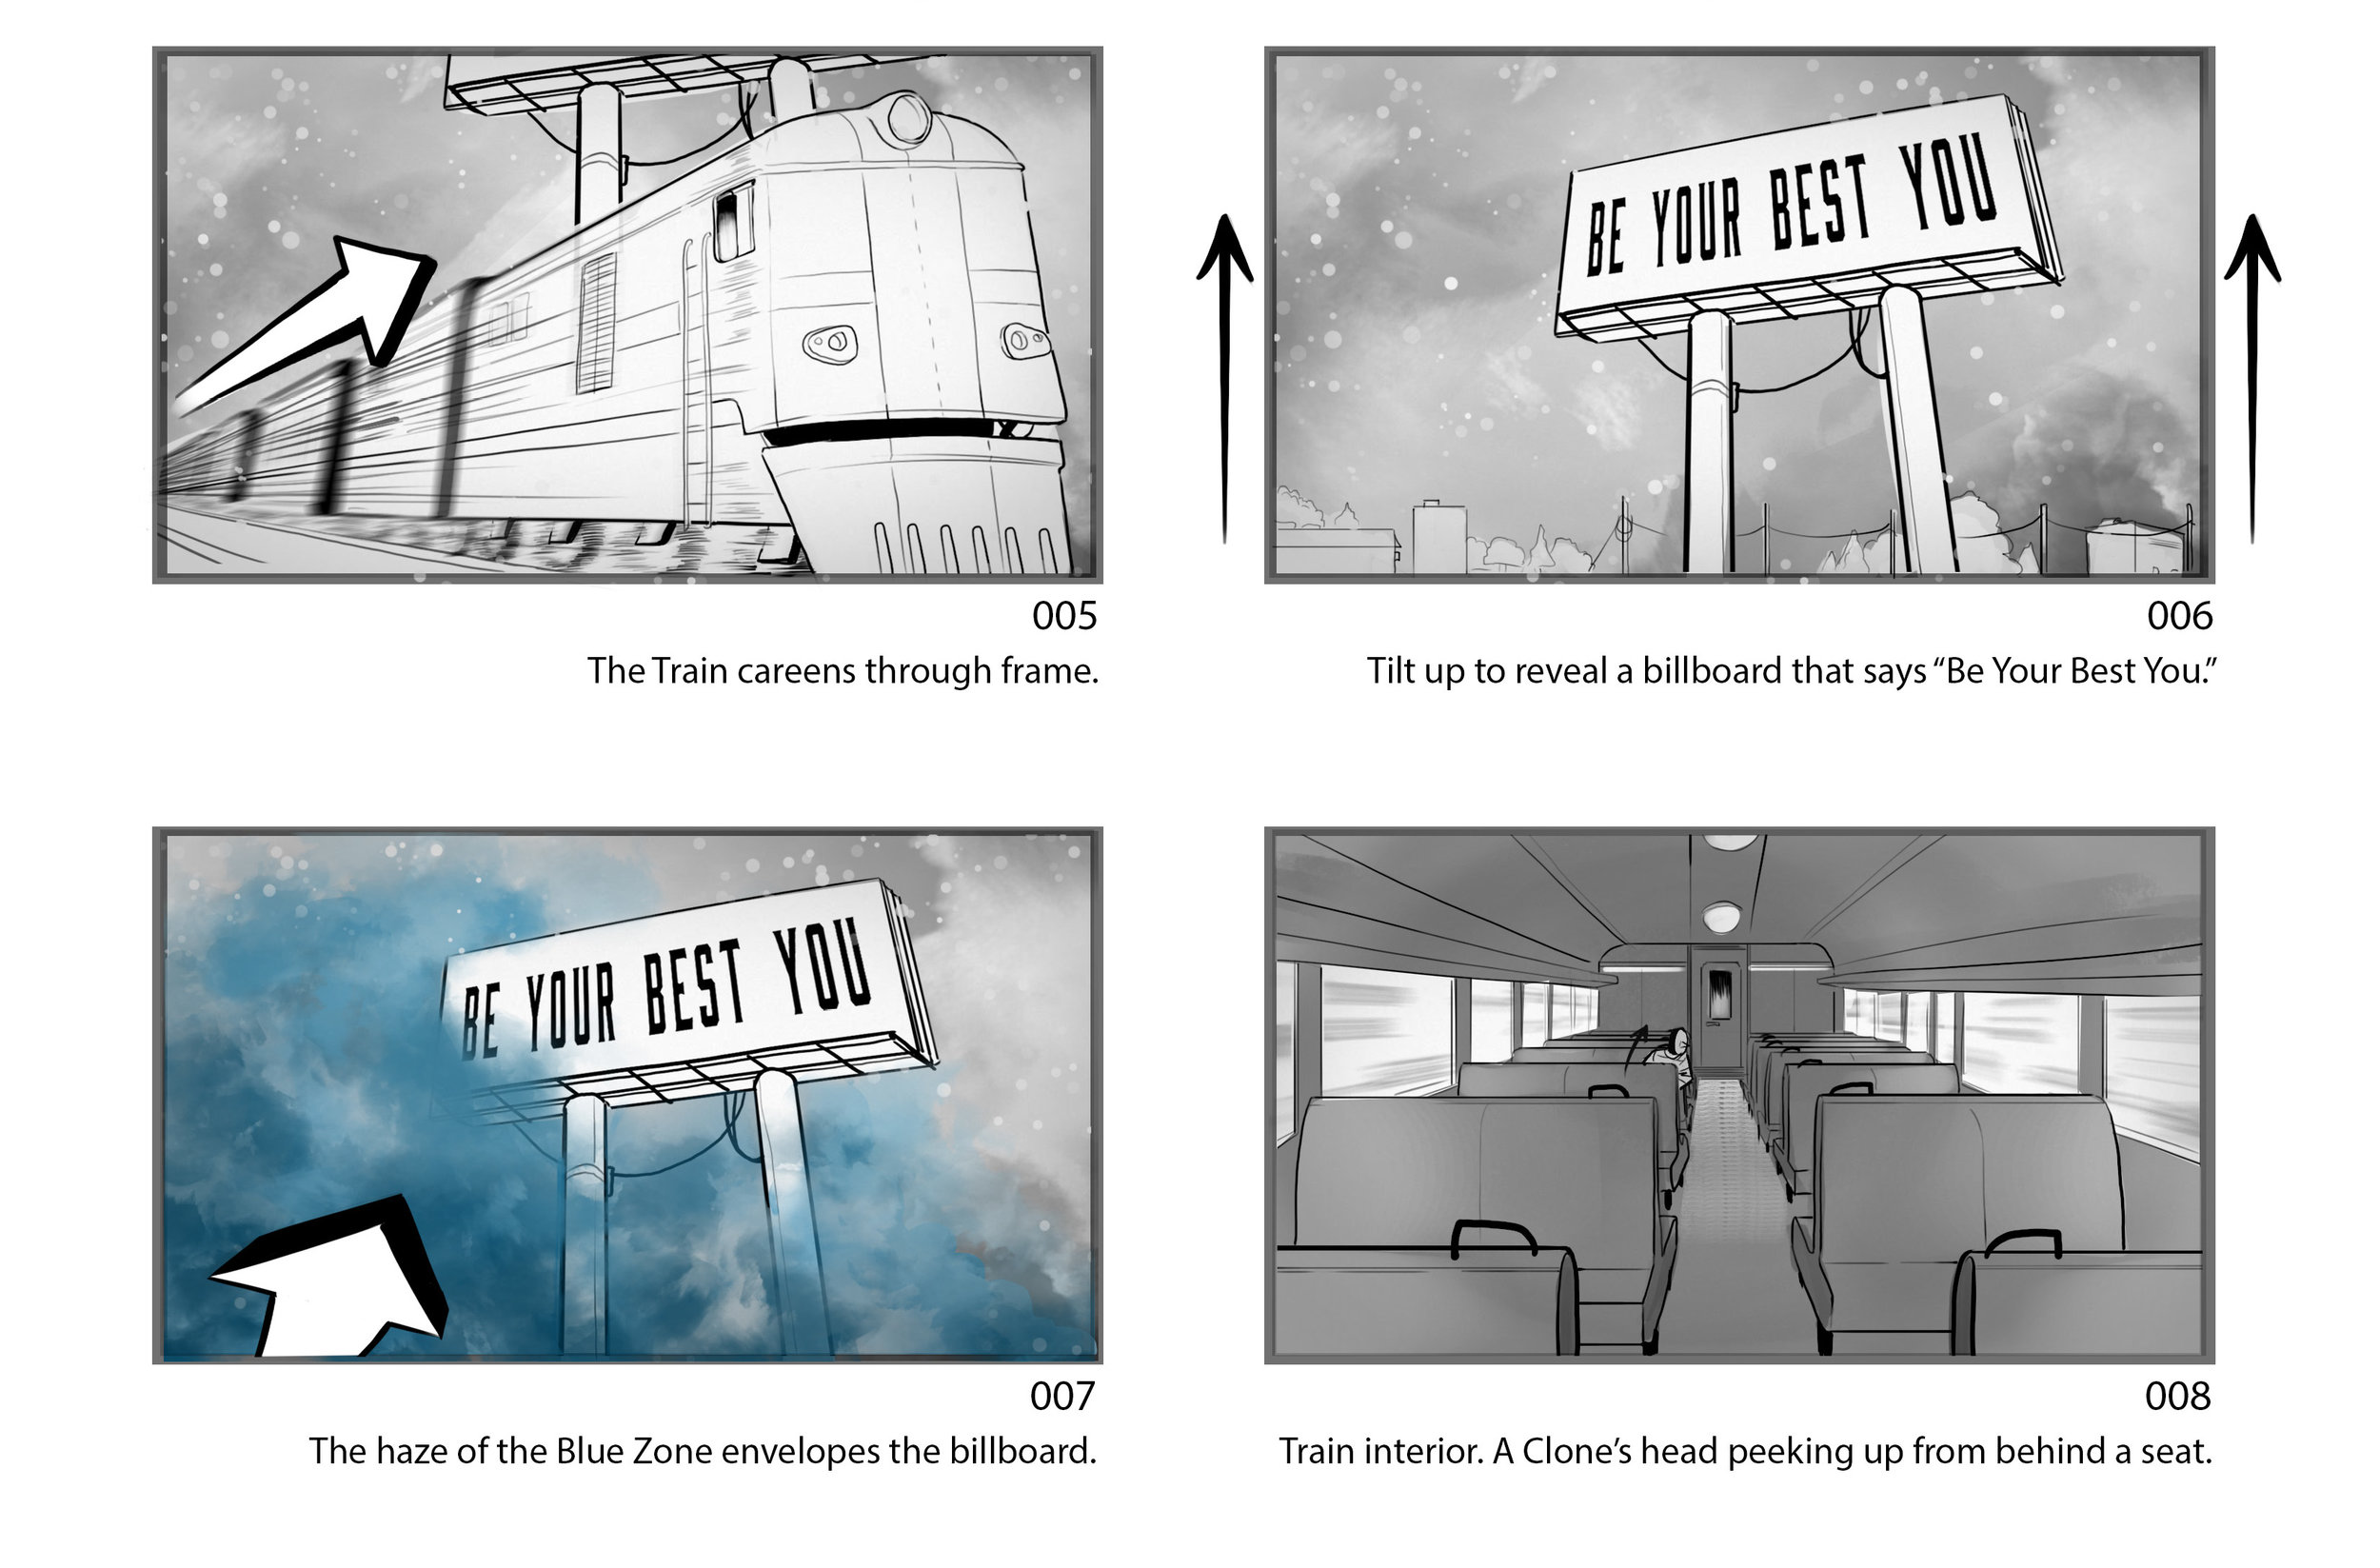 ASGHG_storyboards_0215-2.jpg